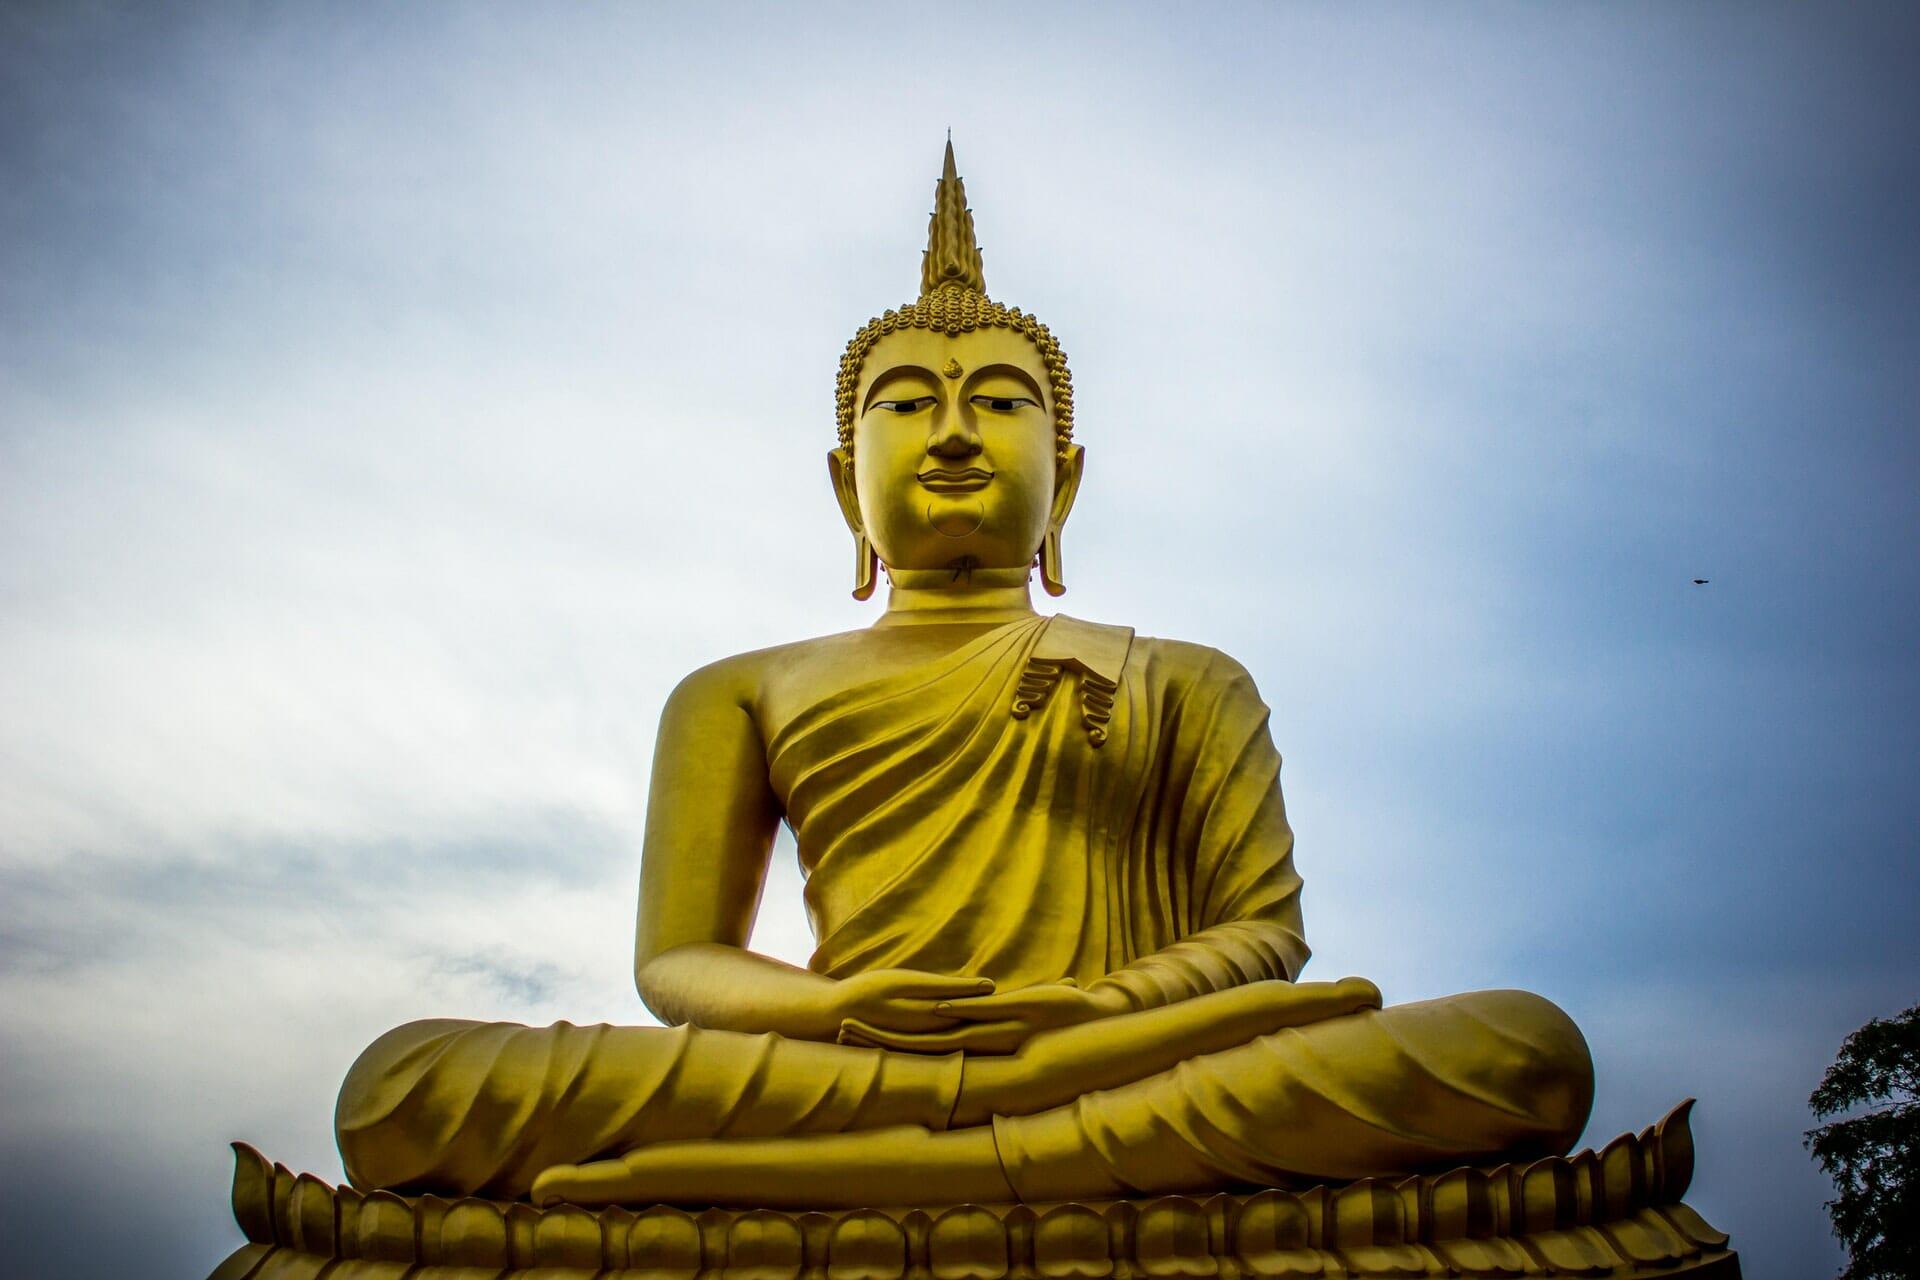 Hd Wallpaper Gautam Buddha Siddhartha Gautama The Life And Teachings Of The Buddha